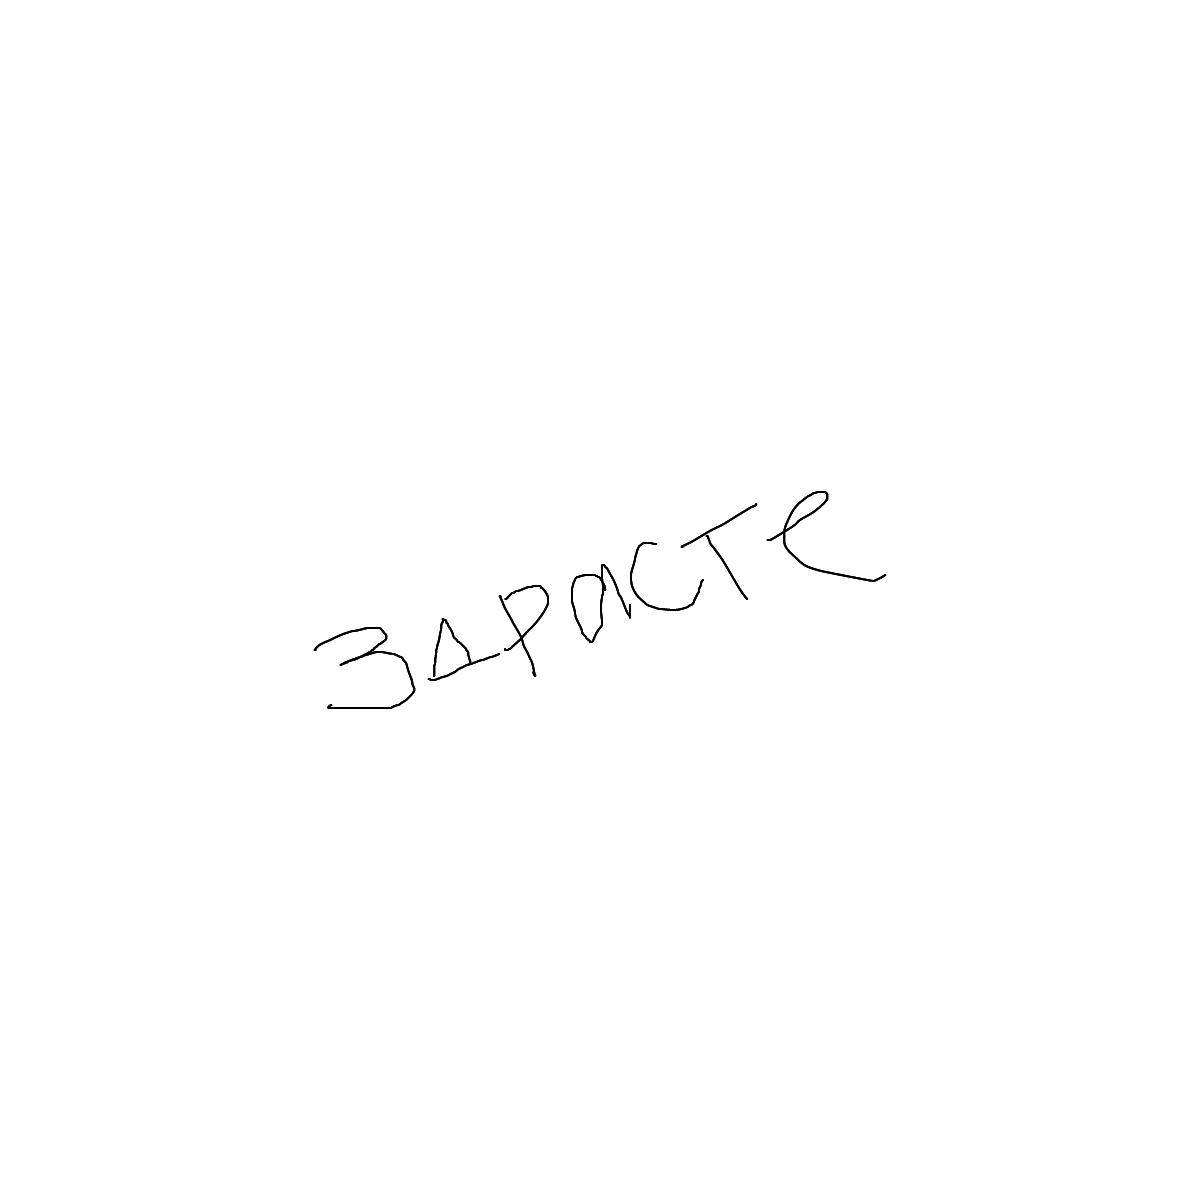 BAAAM drawing#22285 lat:55.7520904541015600lng: 37.6202430725097660